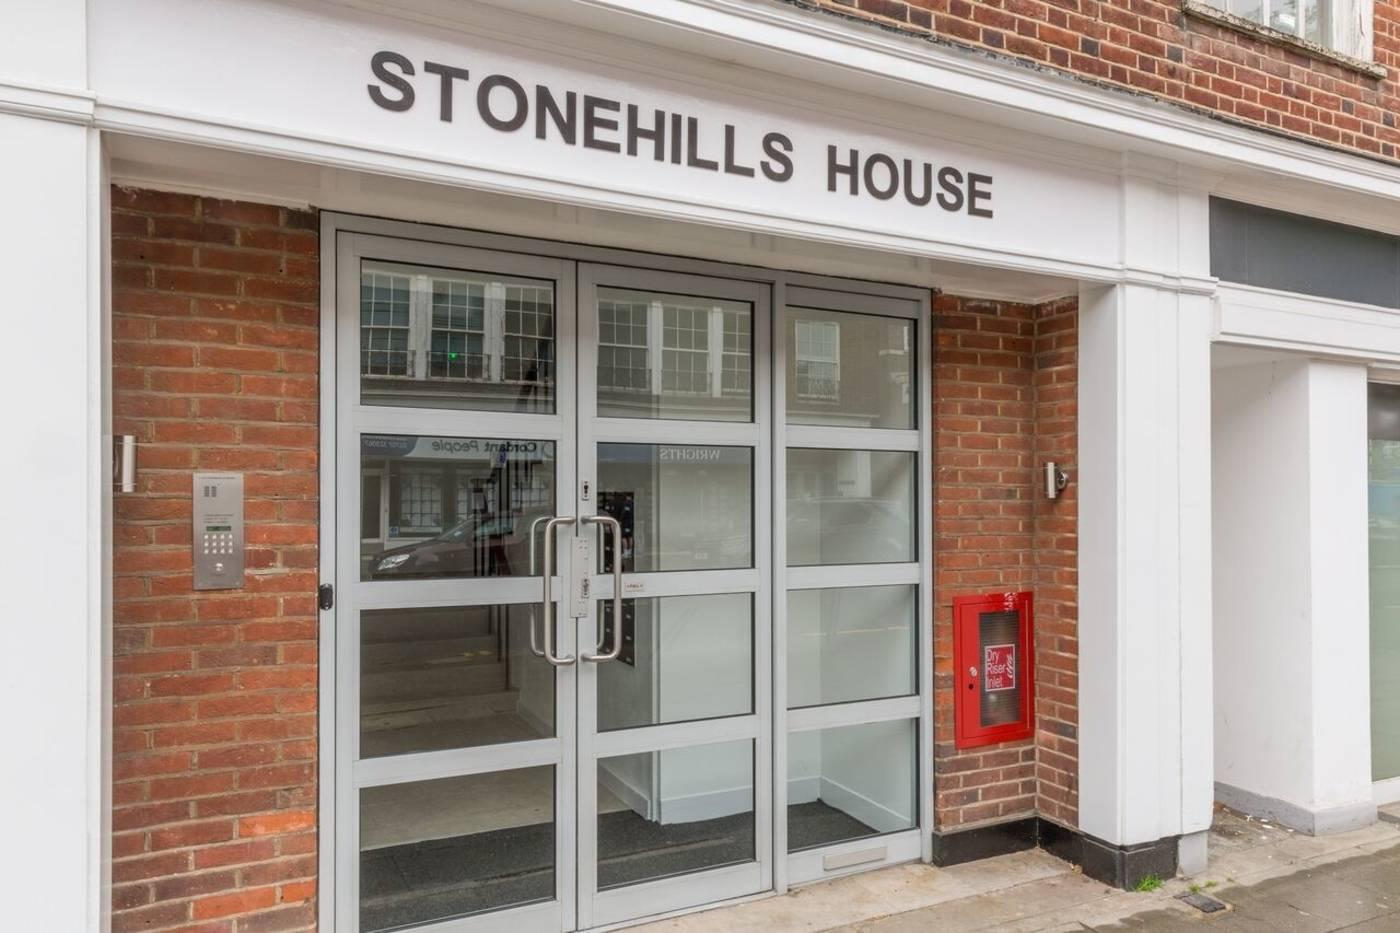 Stonehills House, Welwyn Garden City AL8 6NA